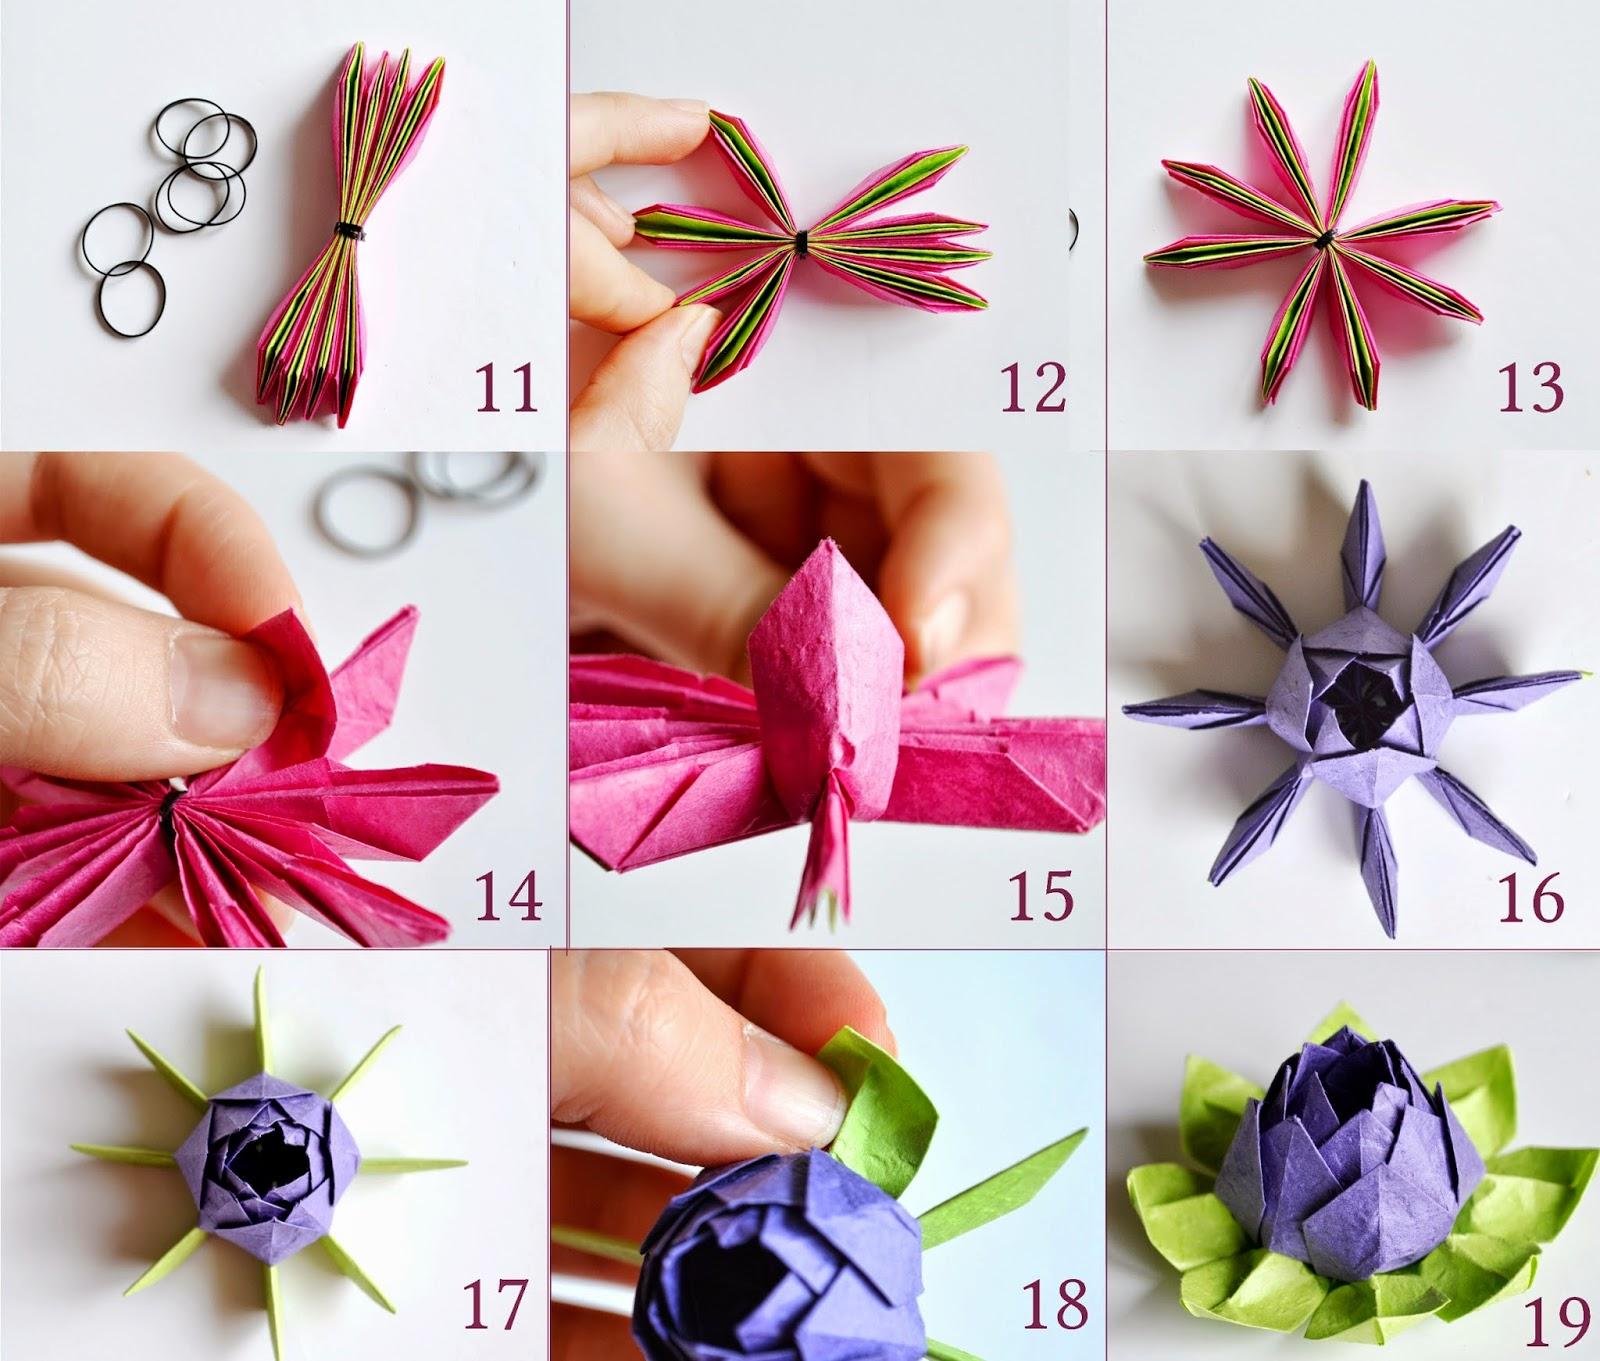 Цветки лотоса своими руками